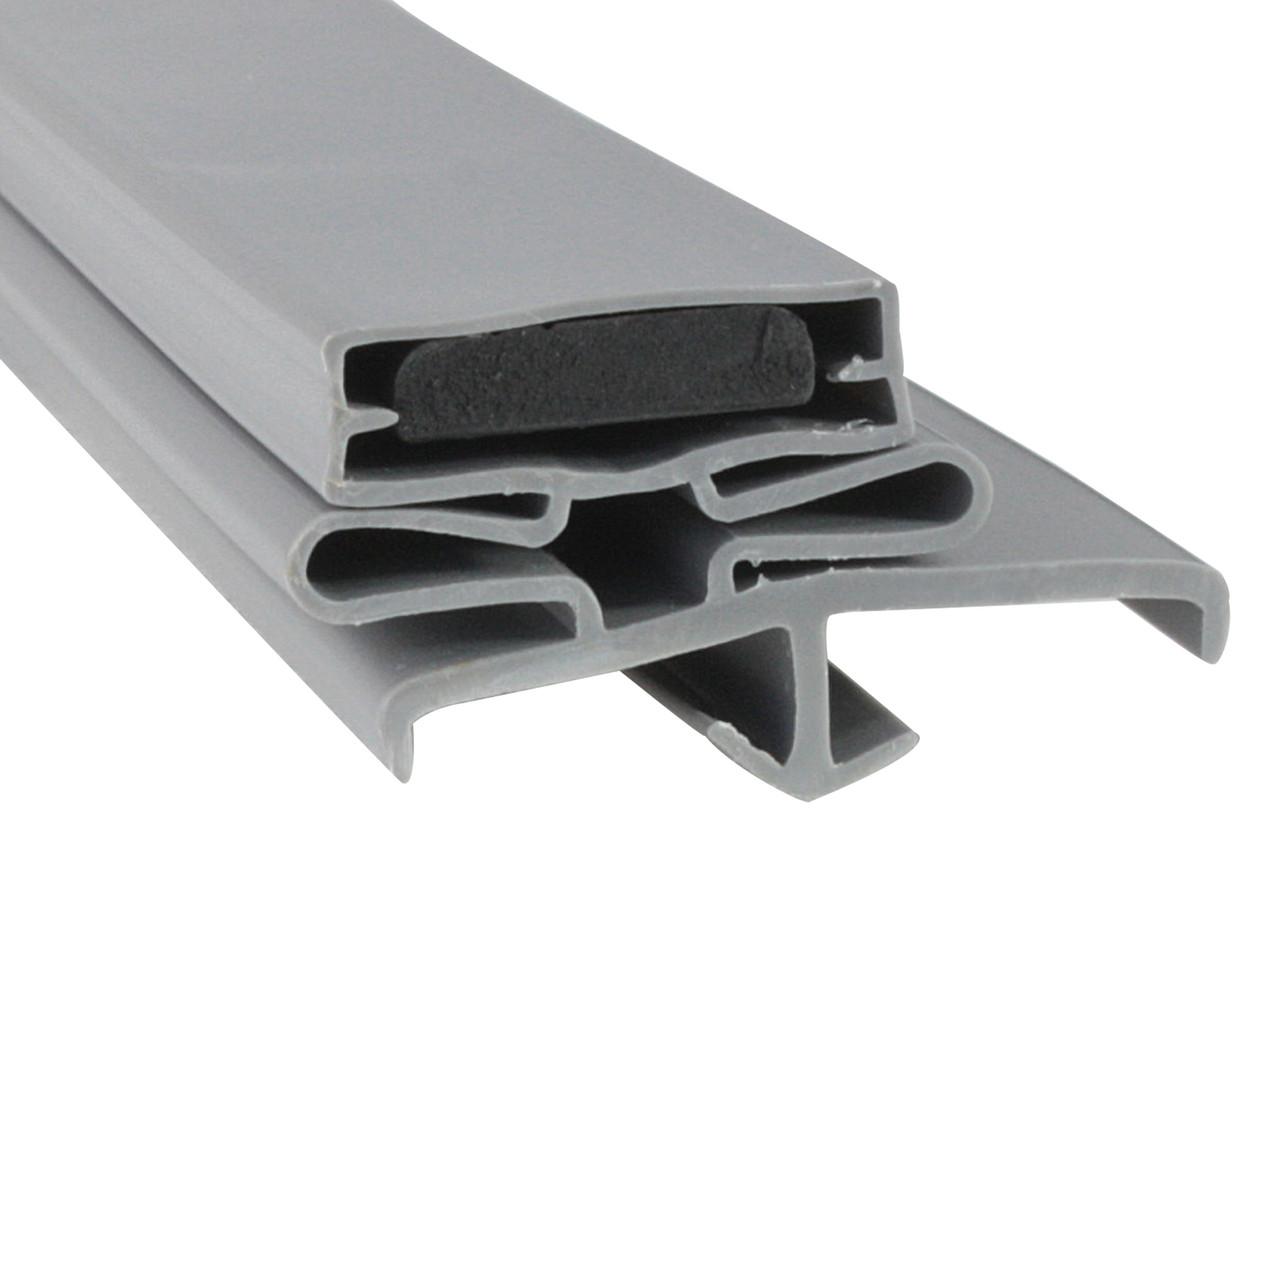 Kolpak Door Gasket Profile 168 36 x 78 1/2 -1